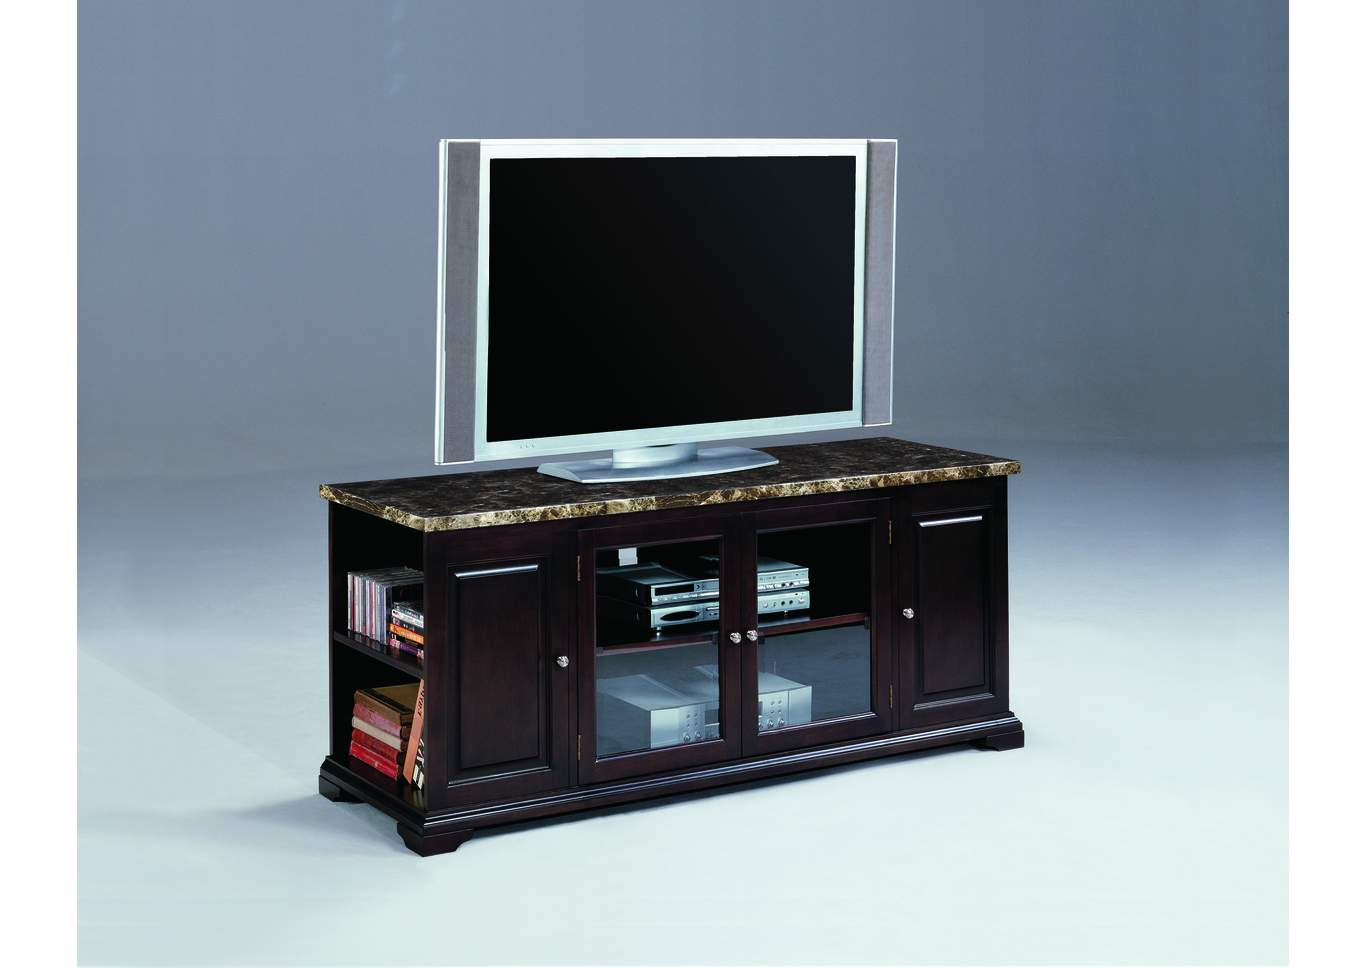 Furniture Merchandise Outlet Murfreesboro Hermitage Tn Harris Marble Top Entertainment